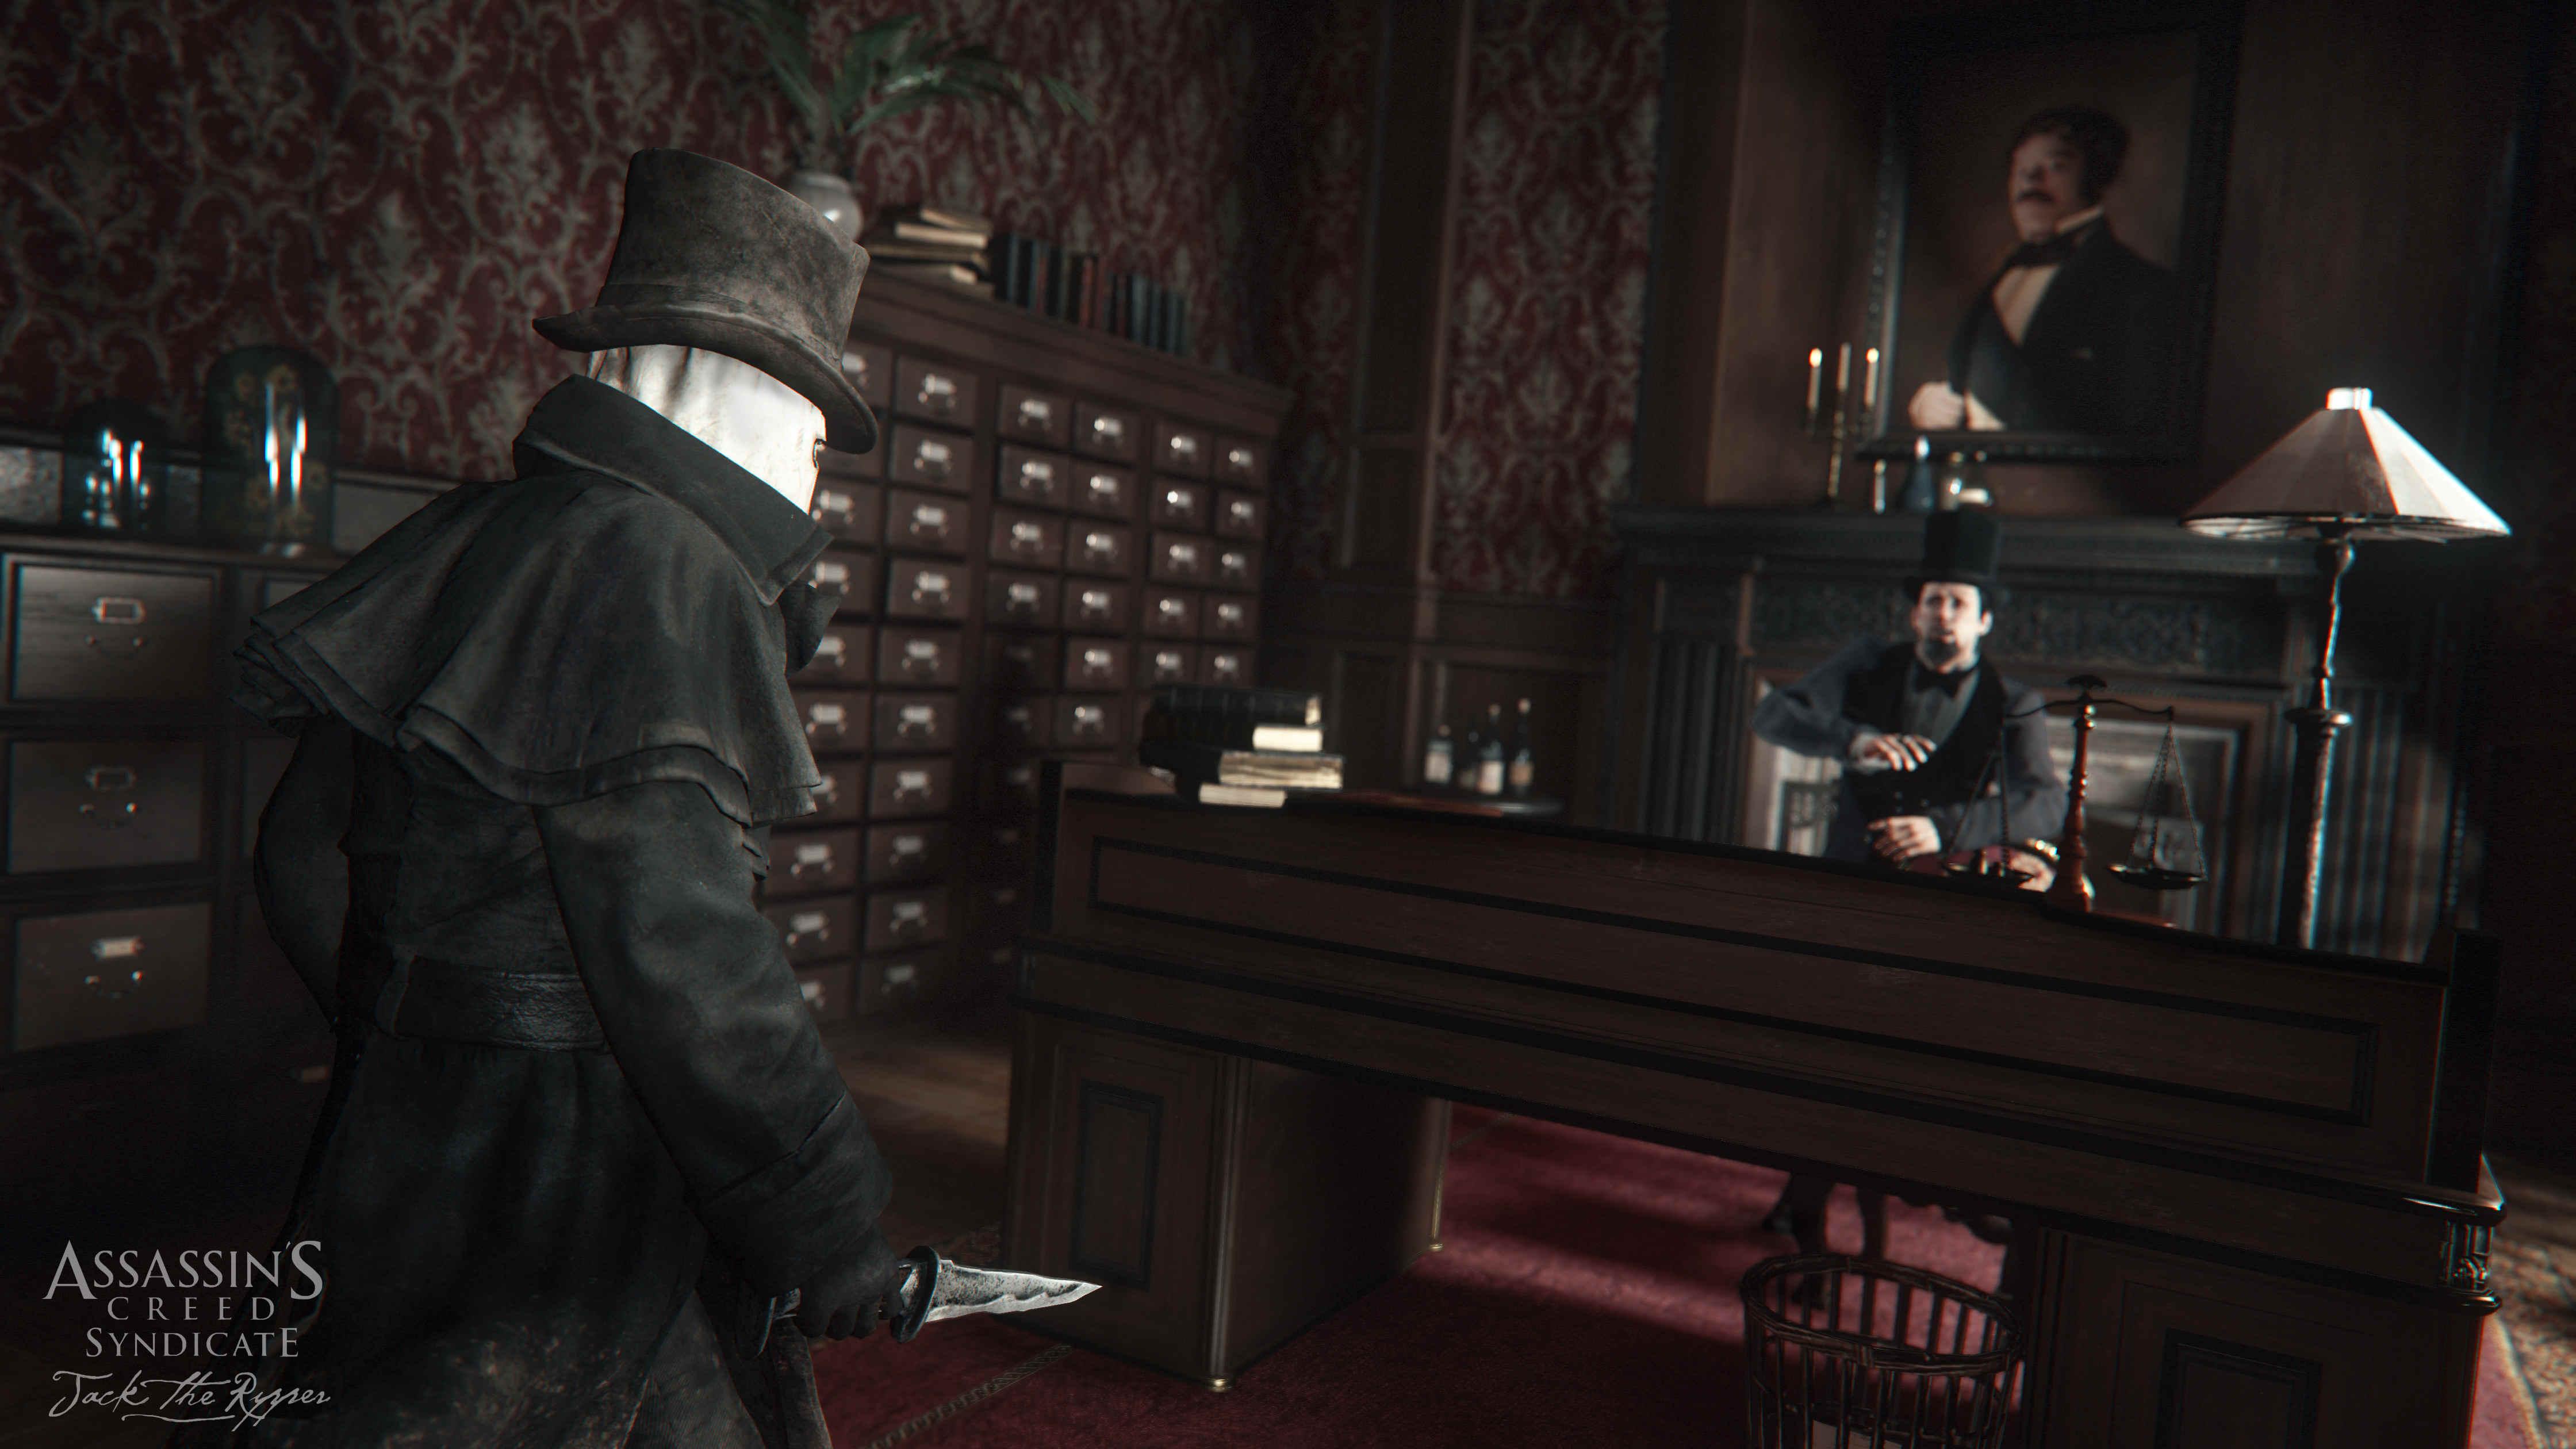 Assassin-sCreed-Syndicate-JackL-eventreur Multi Editeur 003